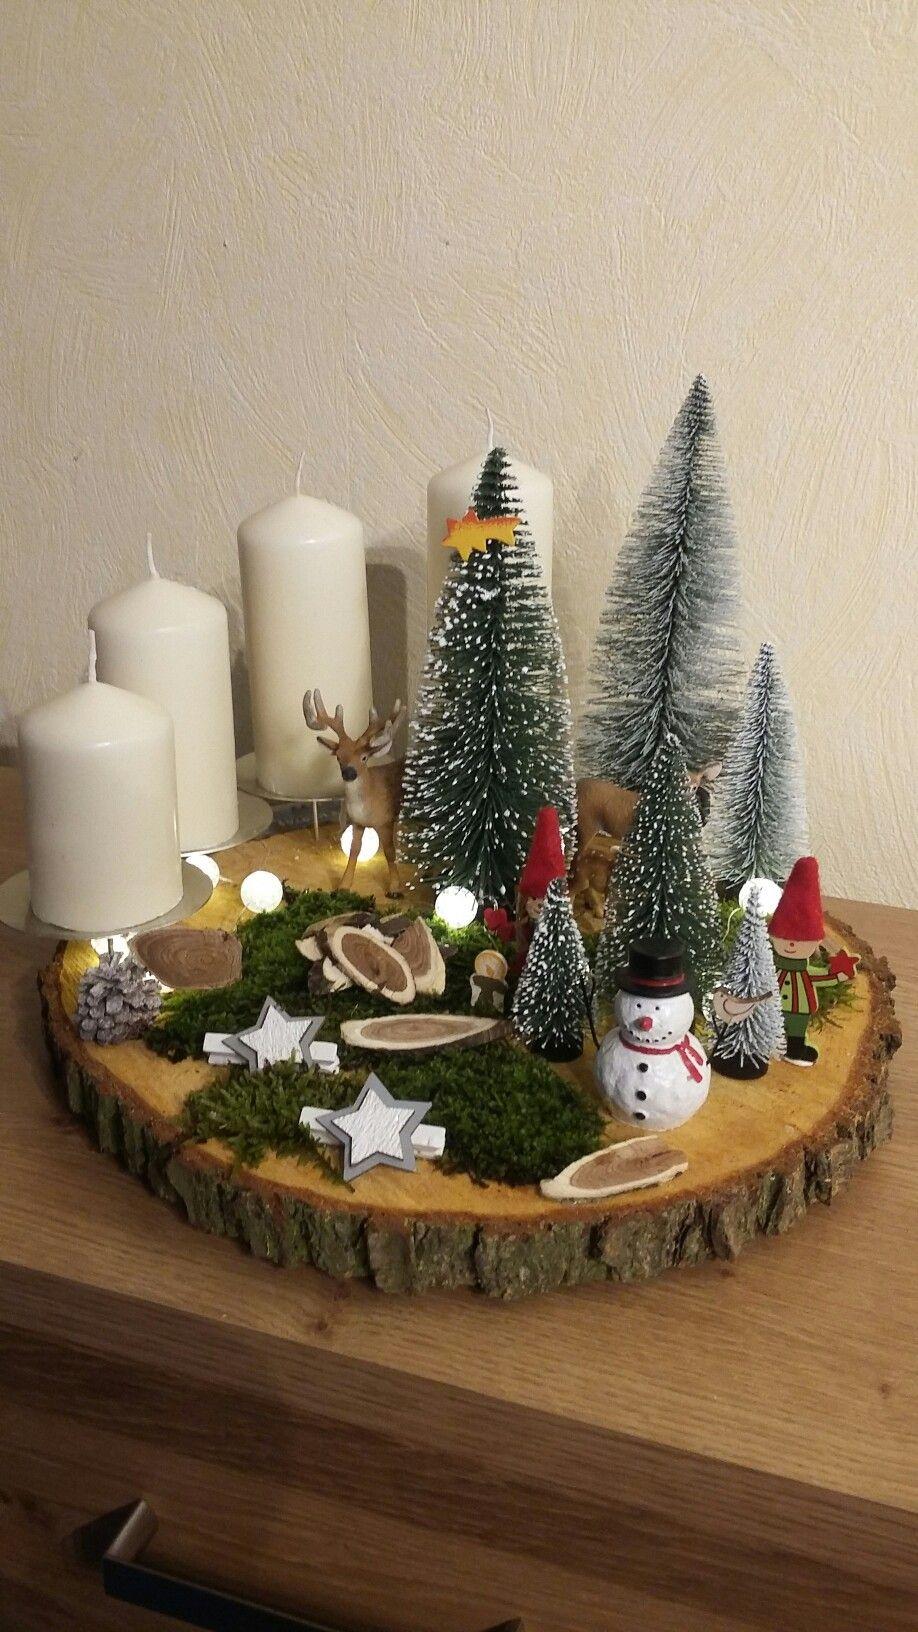 Pin von gina wong auf christmas weihnachtsdekoration for Tischdekoration weihnachten dekoration